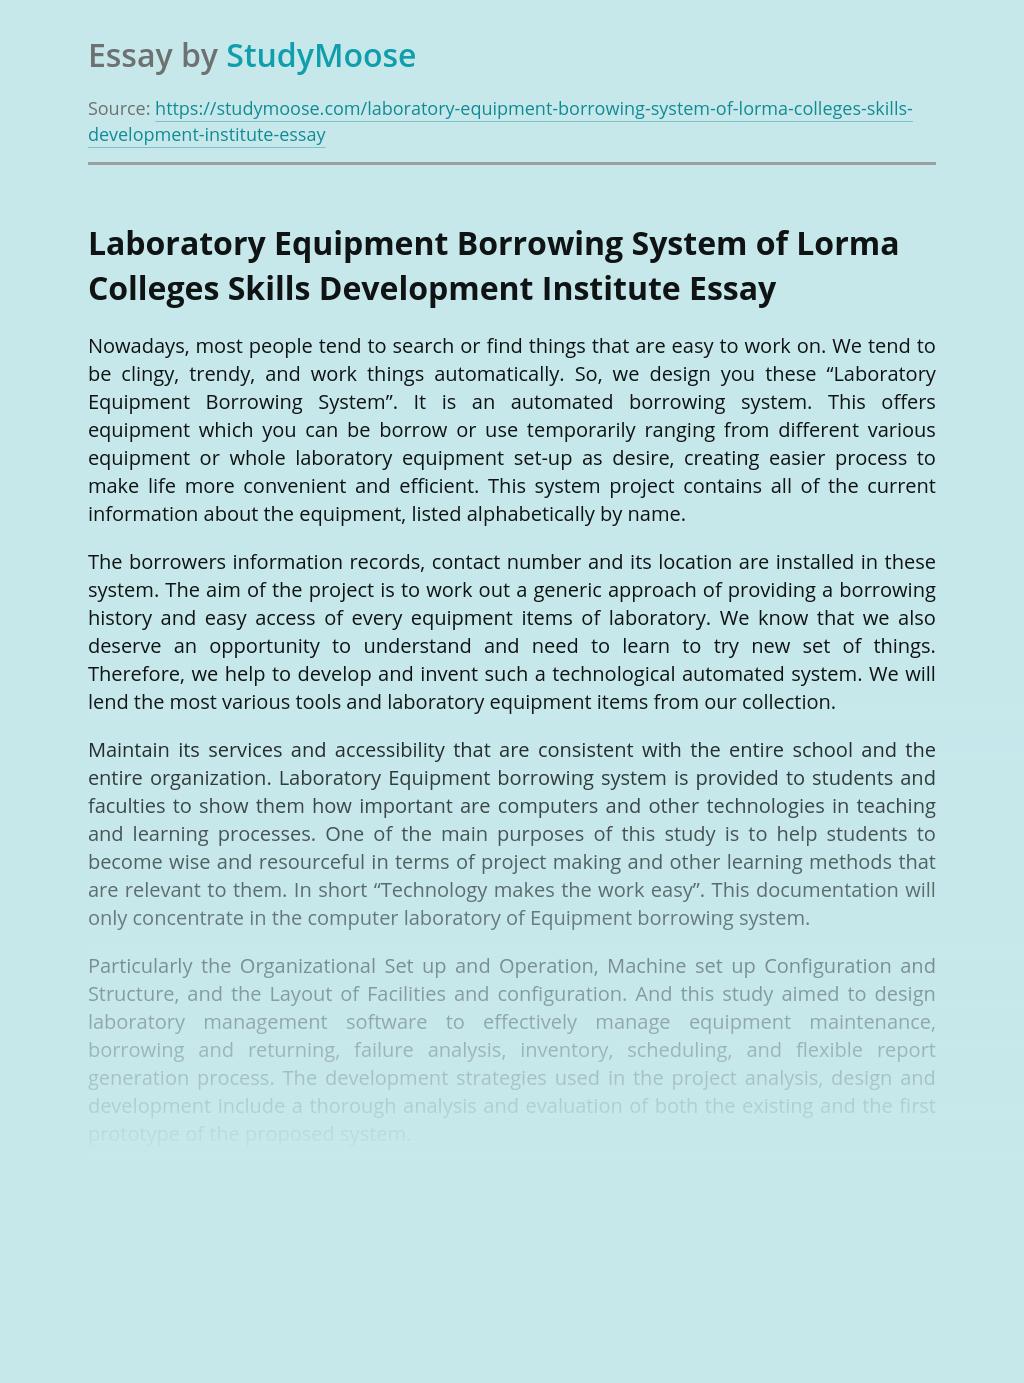 Laboratory Equipment Borrowing System of Lorma Colleges Skills Development Institute